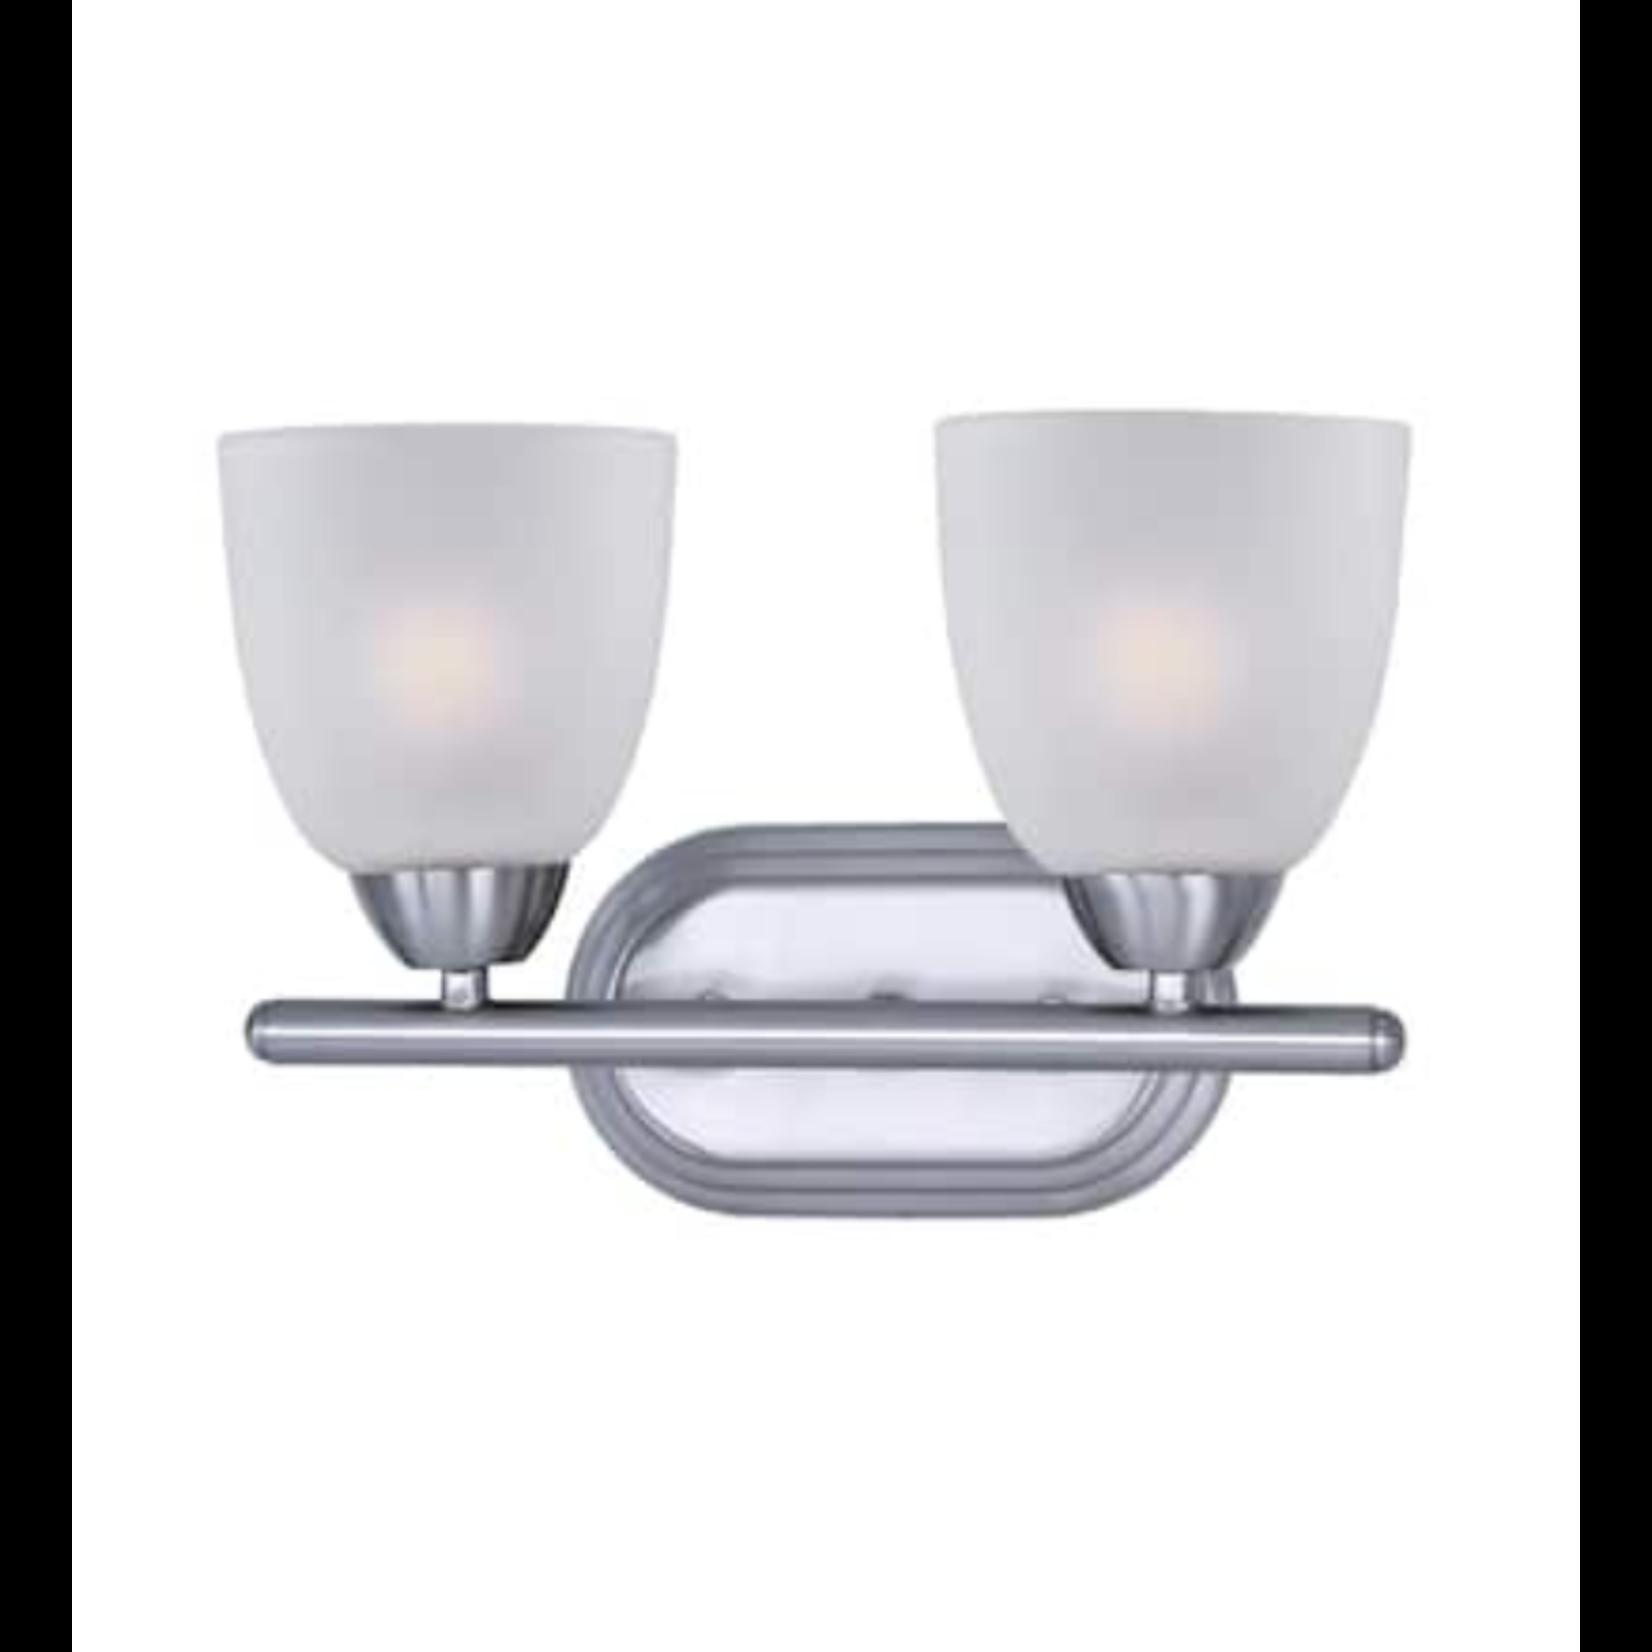 10274 Maxim Lighting 2-Light Vanity Light